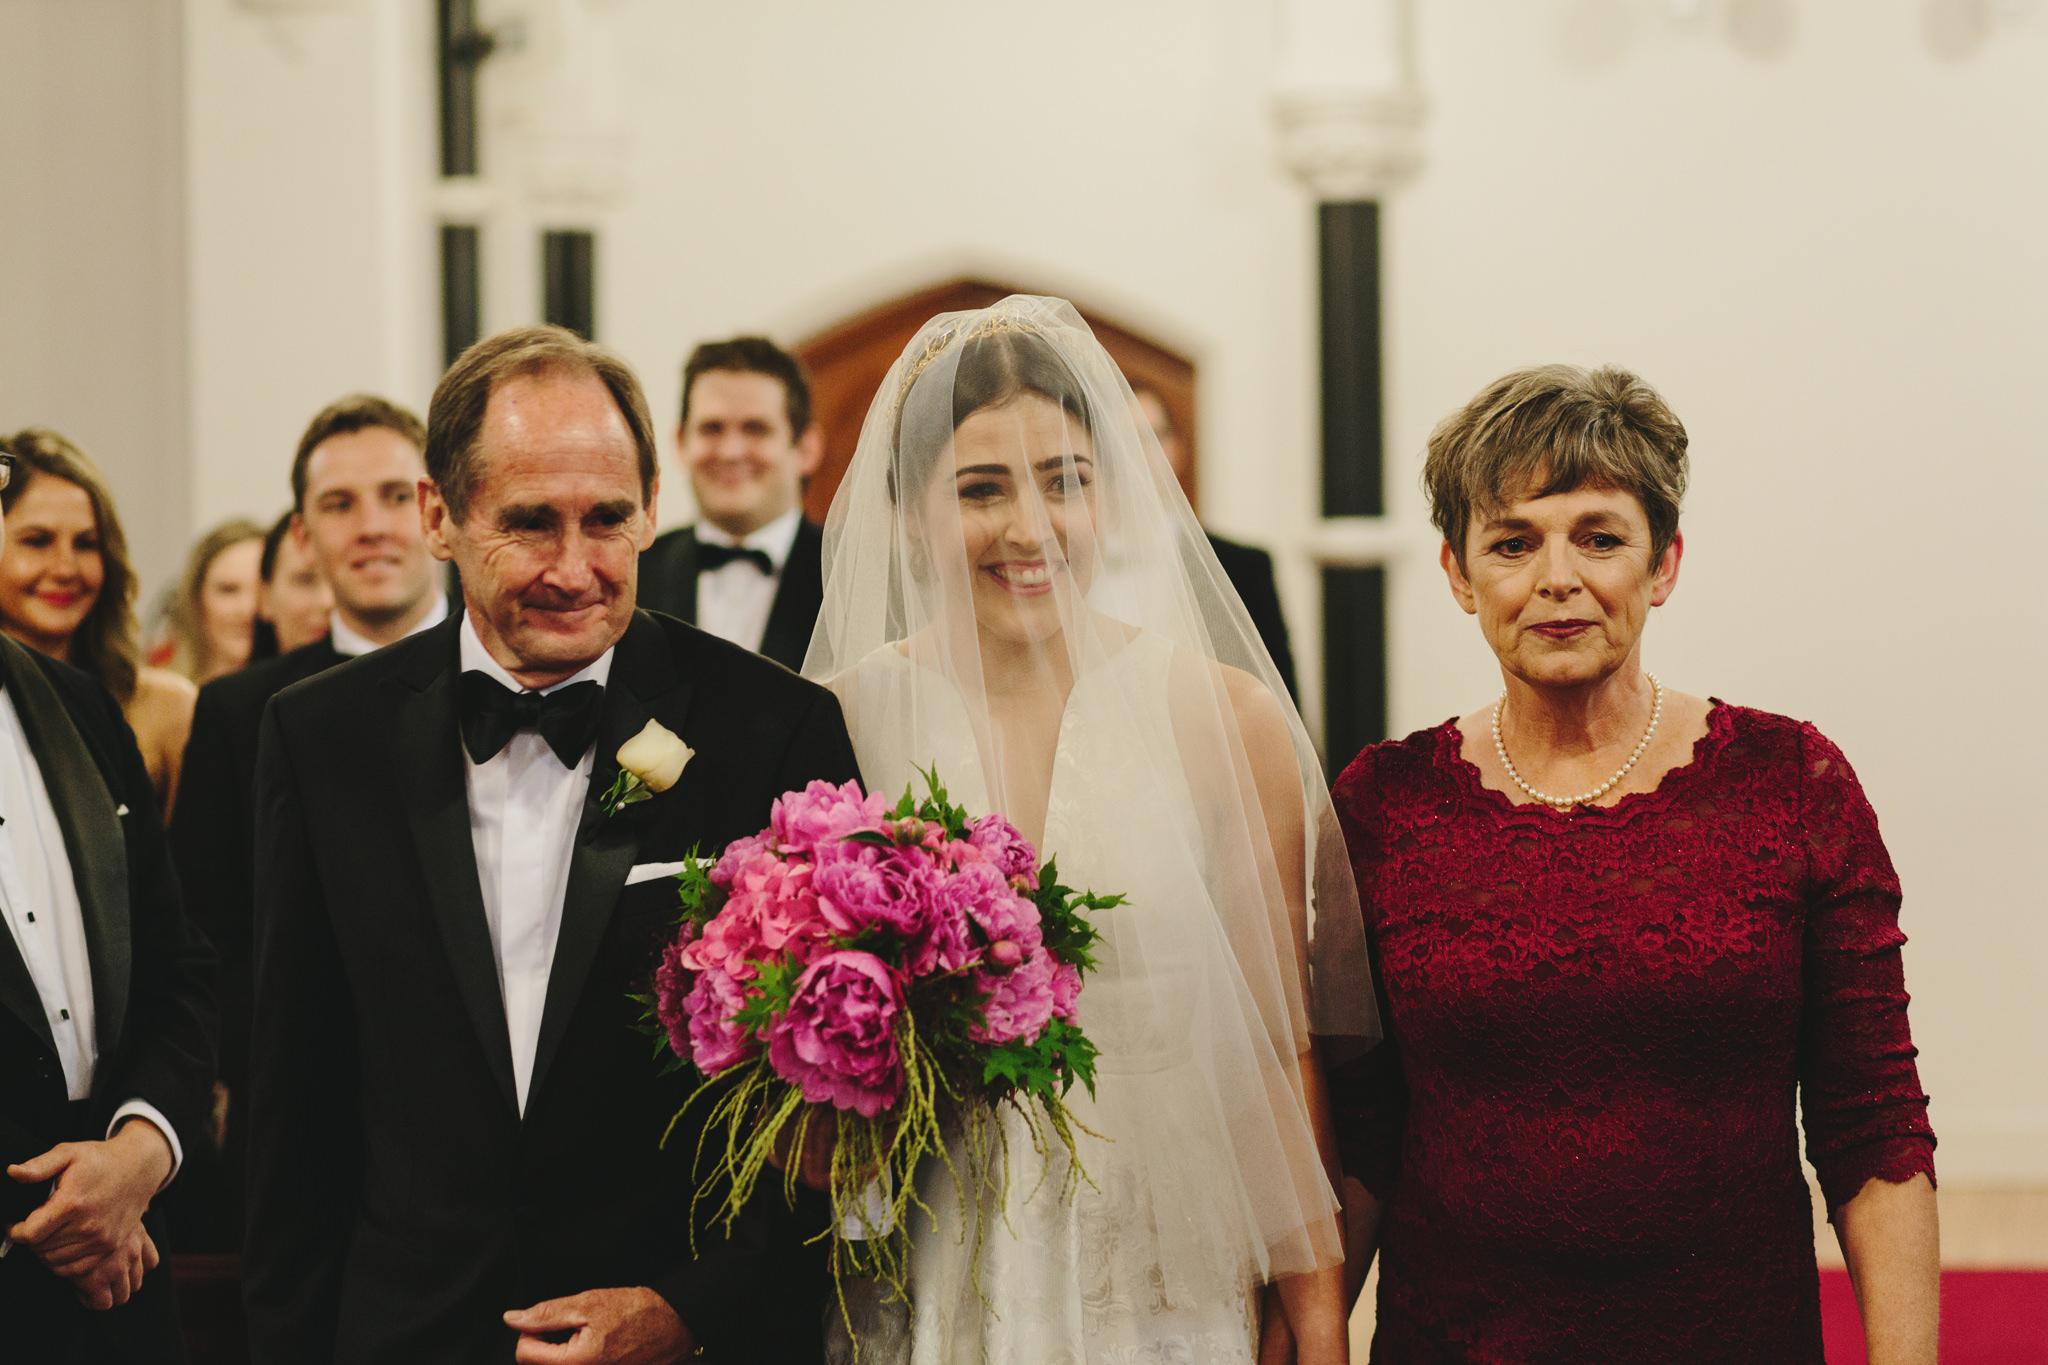 Abbotsford_Convent_Wedding_Peter_Anna050.JPG